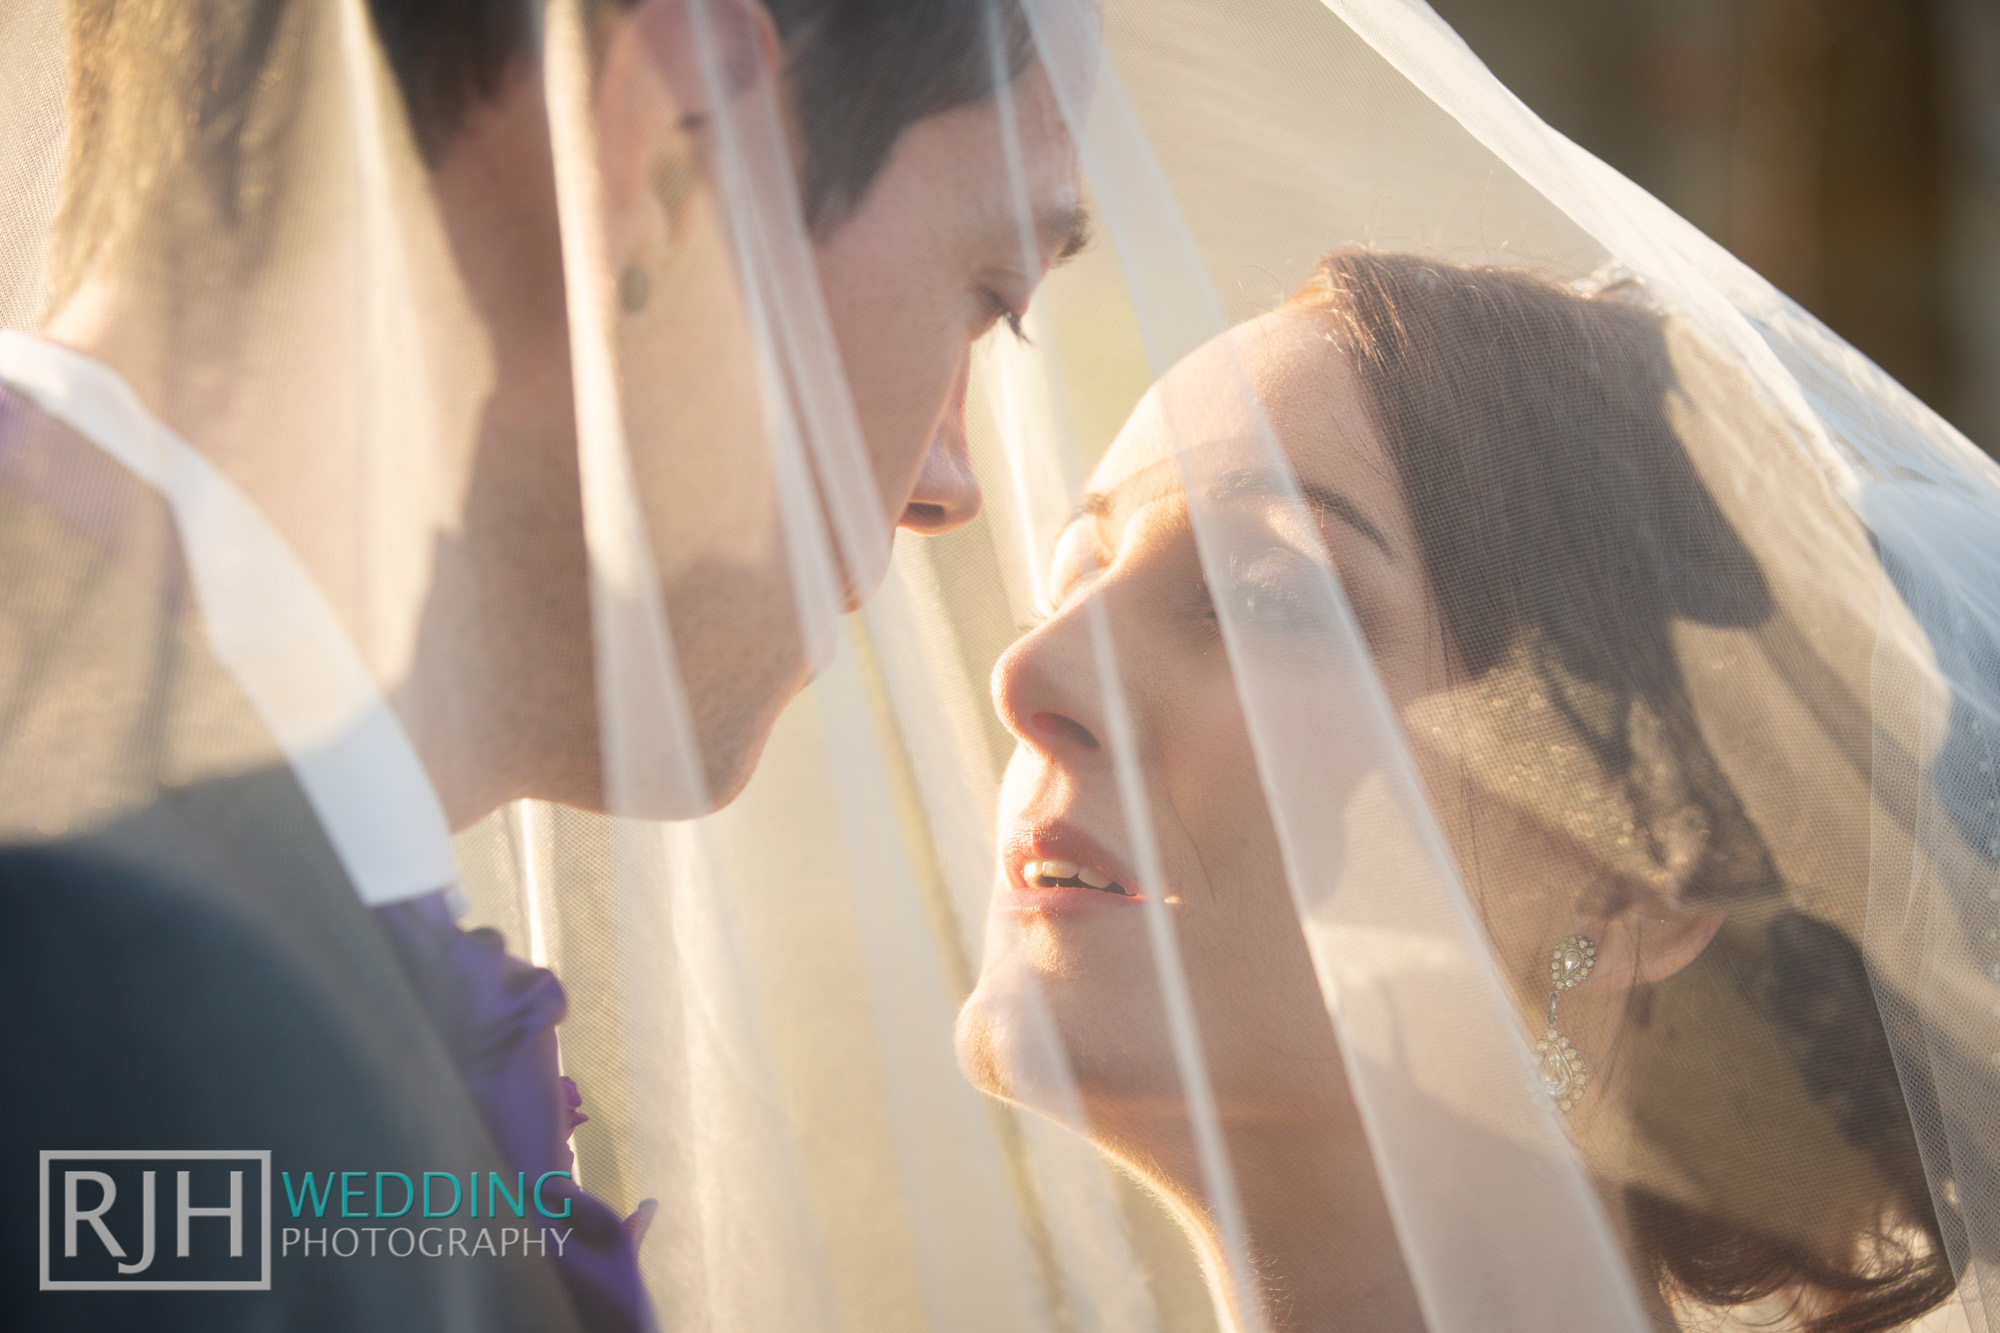 Oulton Hall Wedding Photography_Goodwill-Hall_045_RJH18100.jpg